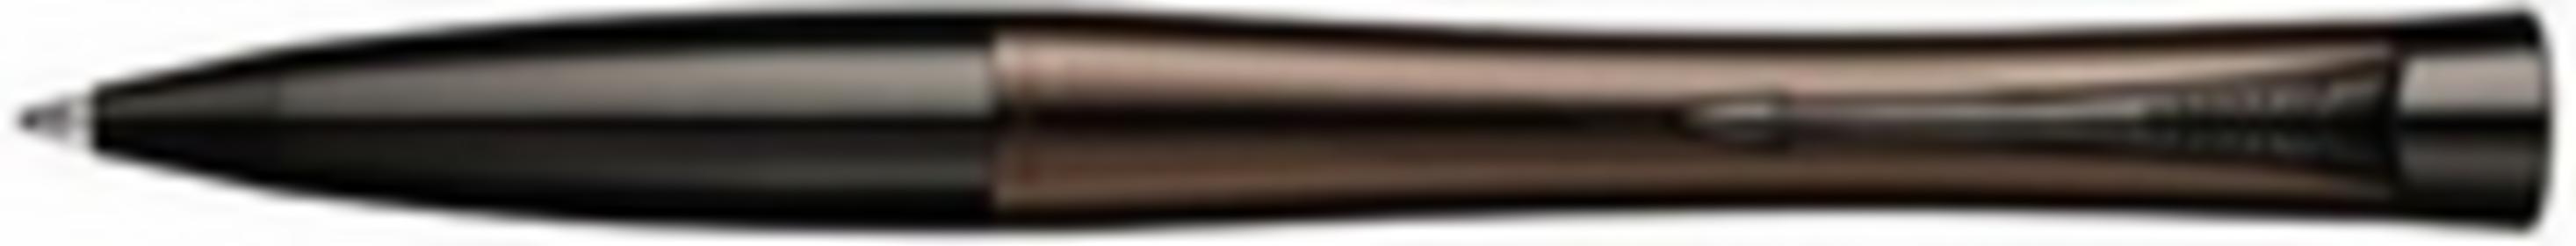 ParkerUrban Premium brązowy